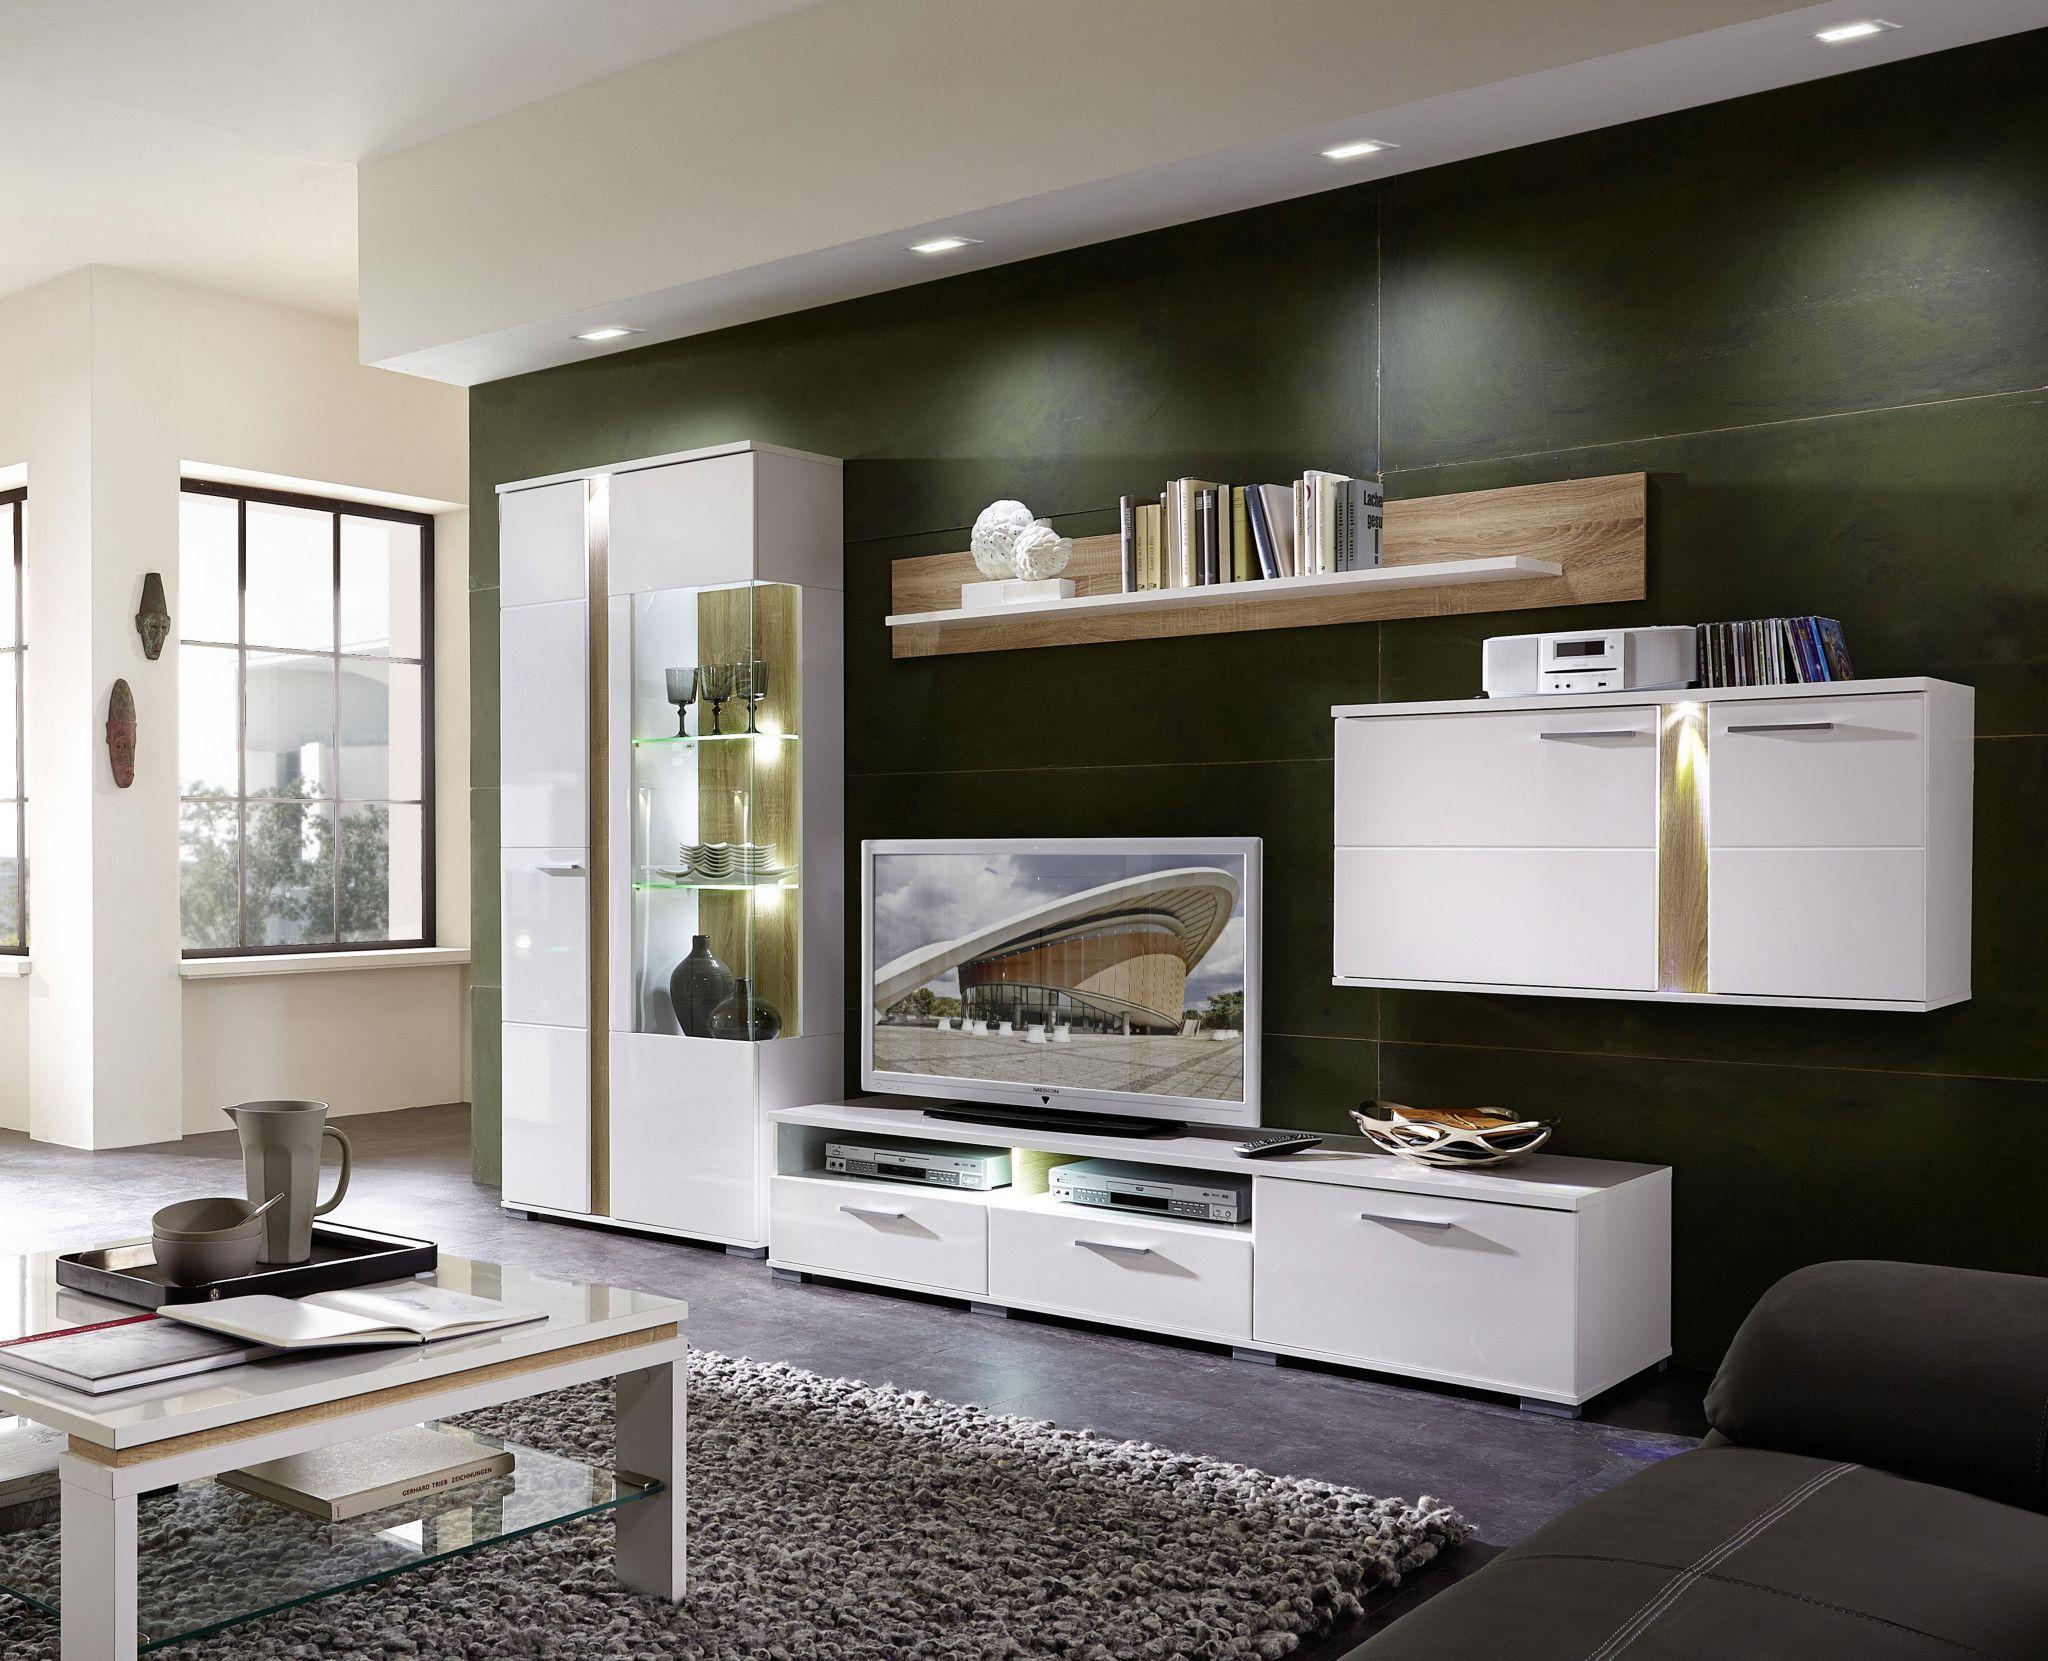 wohnwand weiss hochglanz sonoma eiche hell woody 22 00600. Black Bedroom Furniture Sets. Home Design Ideas